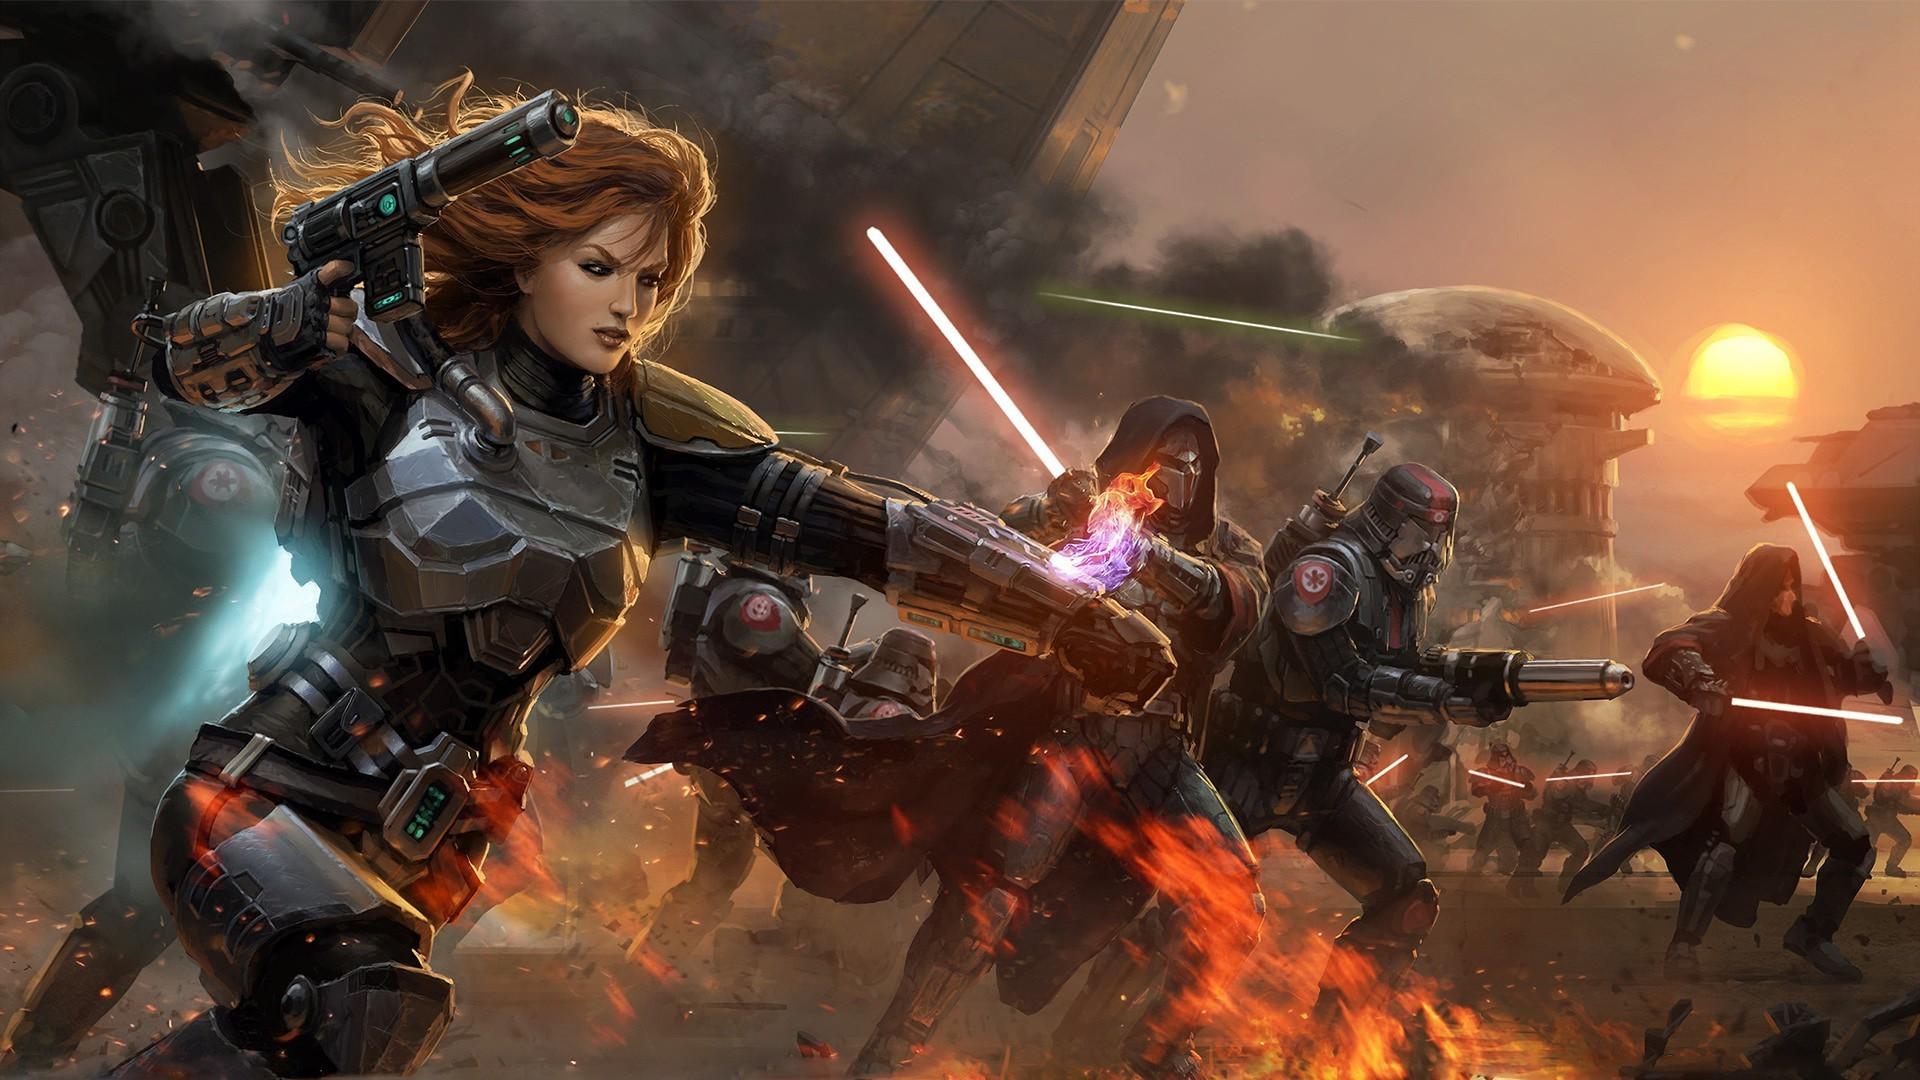 lightsaber, Star Wars, Star Wars: The Old Republic